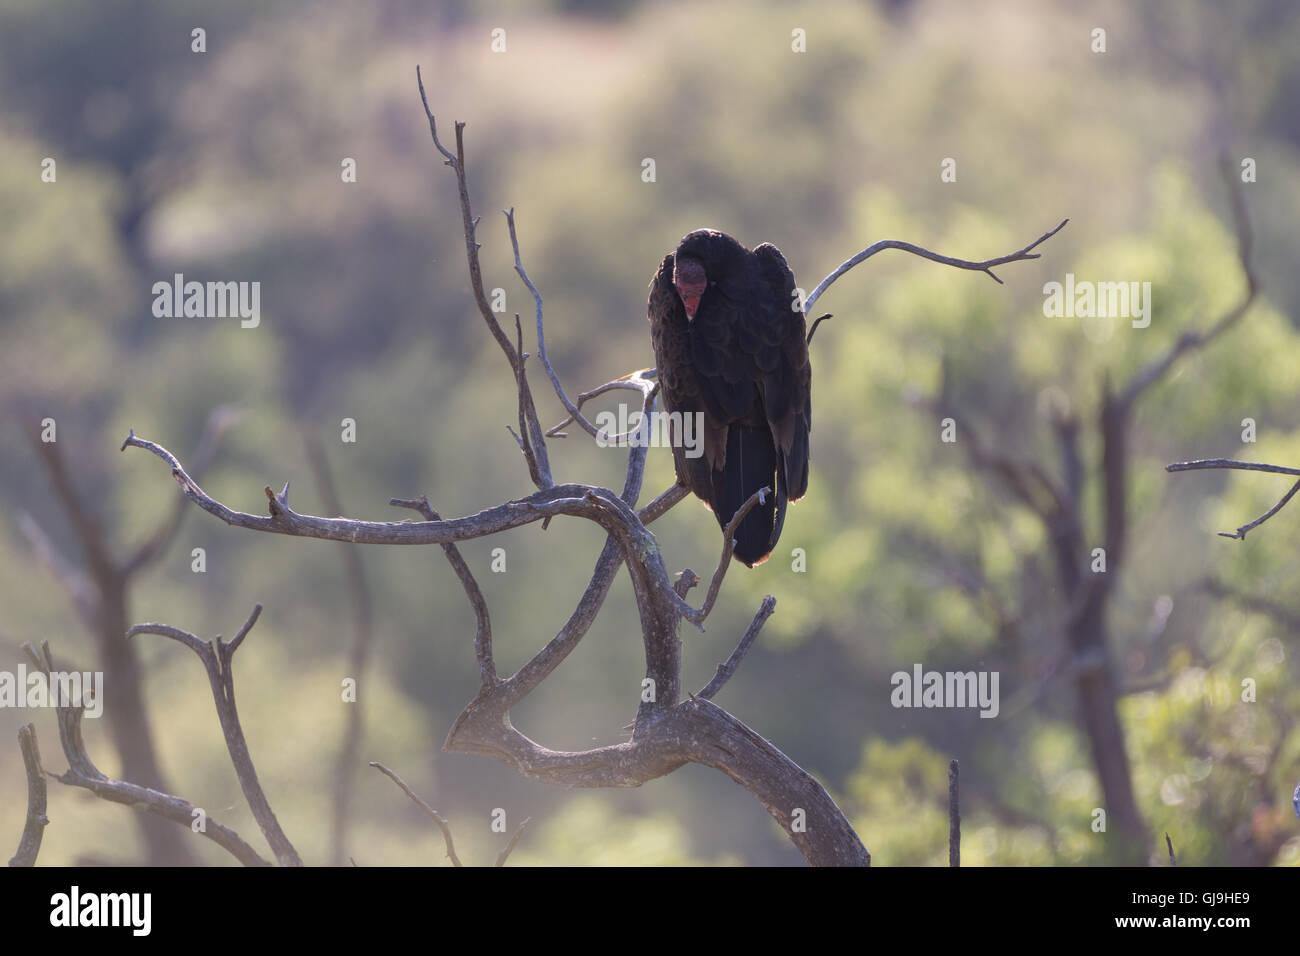 Turkey Vulture, (Cathartes aura), Huachuca mountains, Arizona, USA. - Stock Image